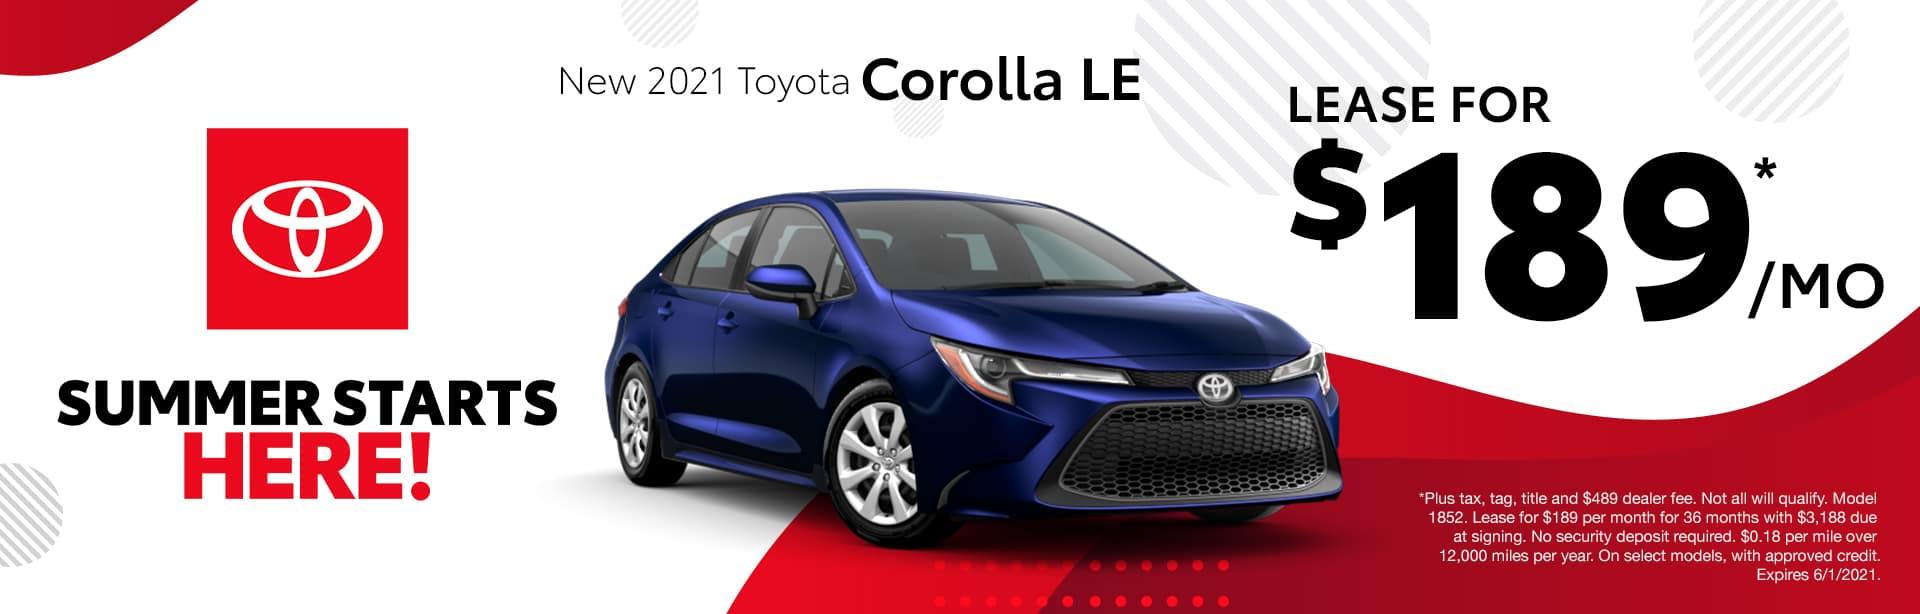 New 2021 Toyota Corolla Albertville AL